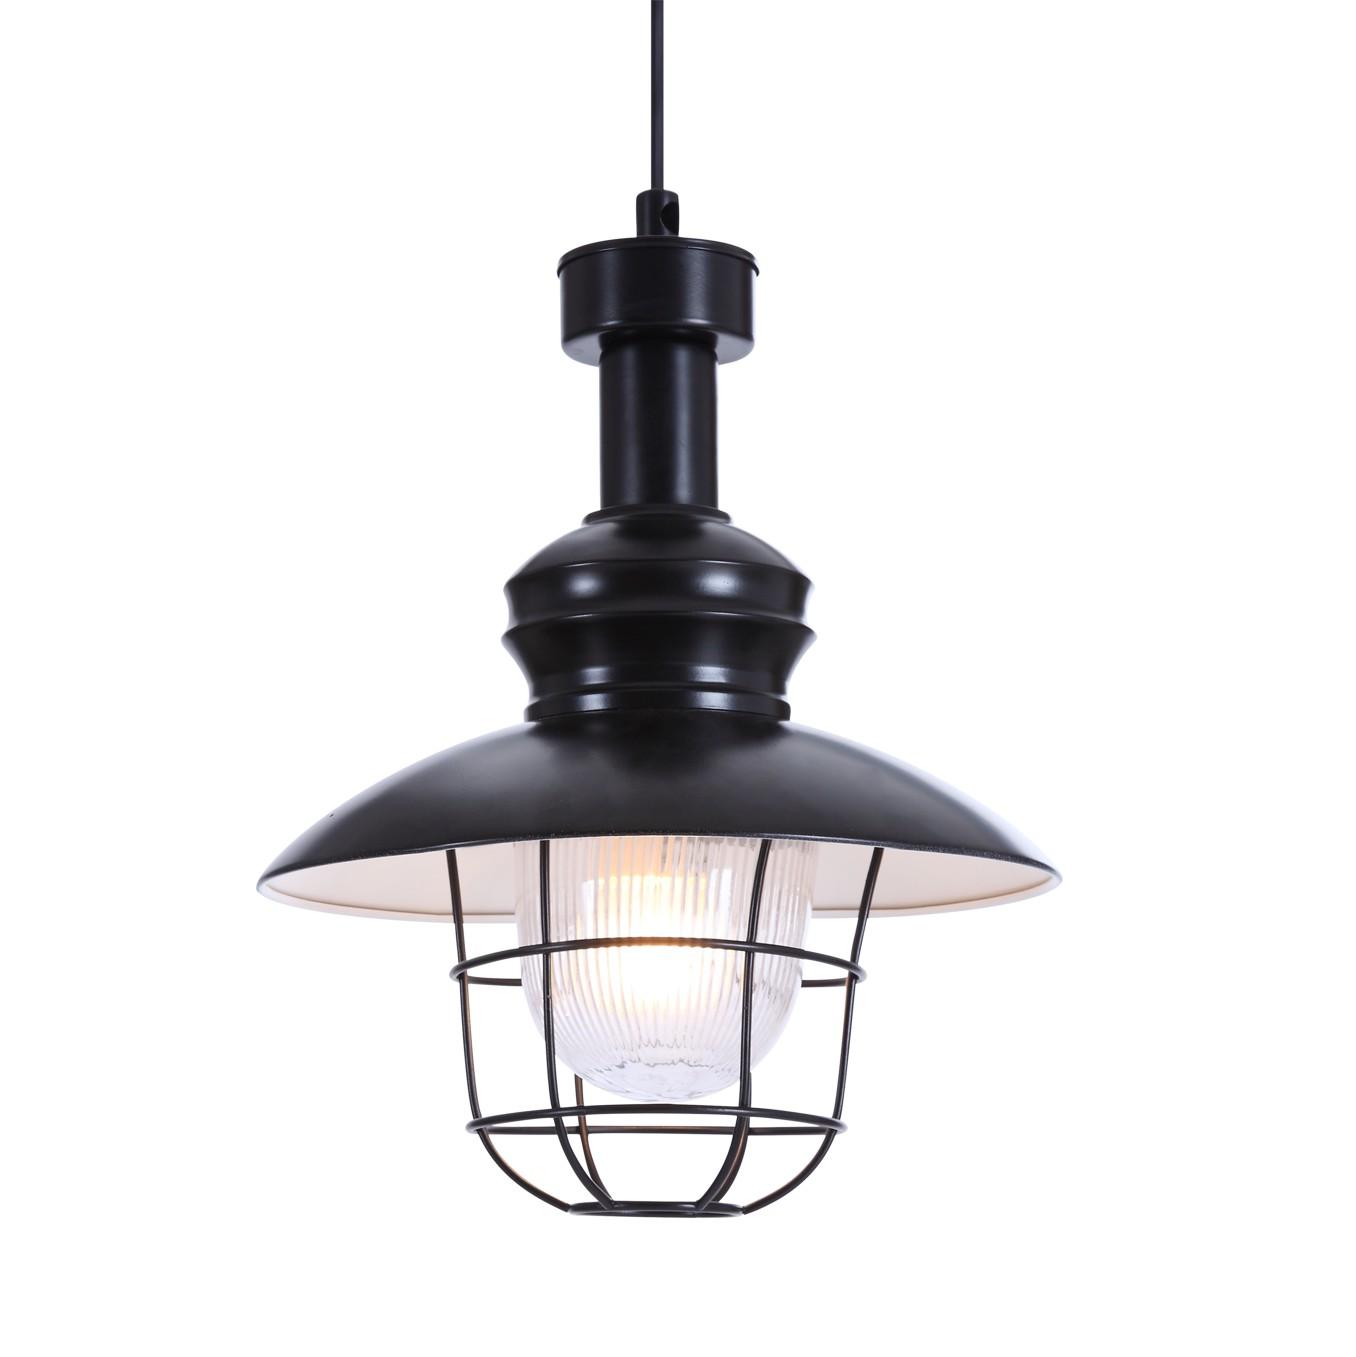 pendelleuchte lewis metall glas 1 flammig loistaa a bestellen. Black Bedroom Furniture Sets. Home Design Ideas